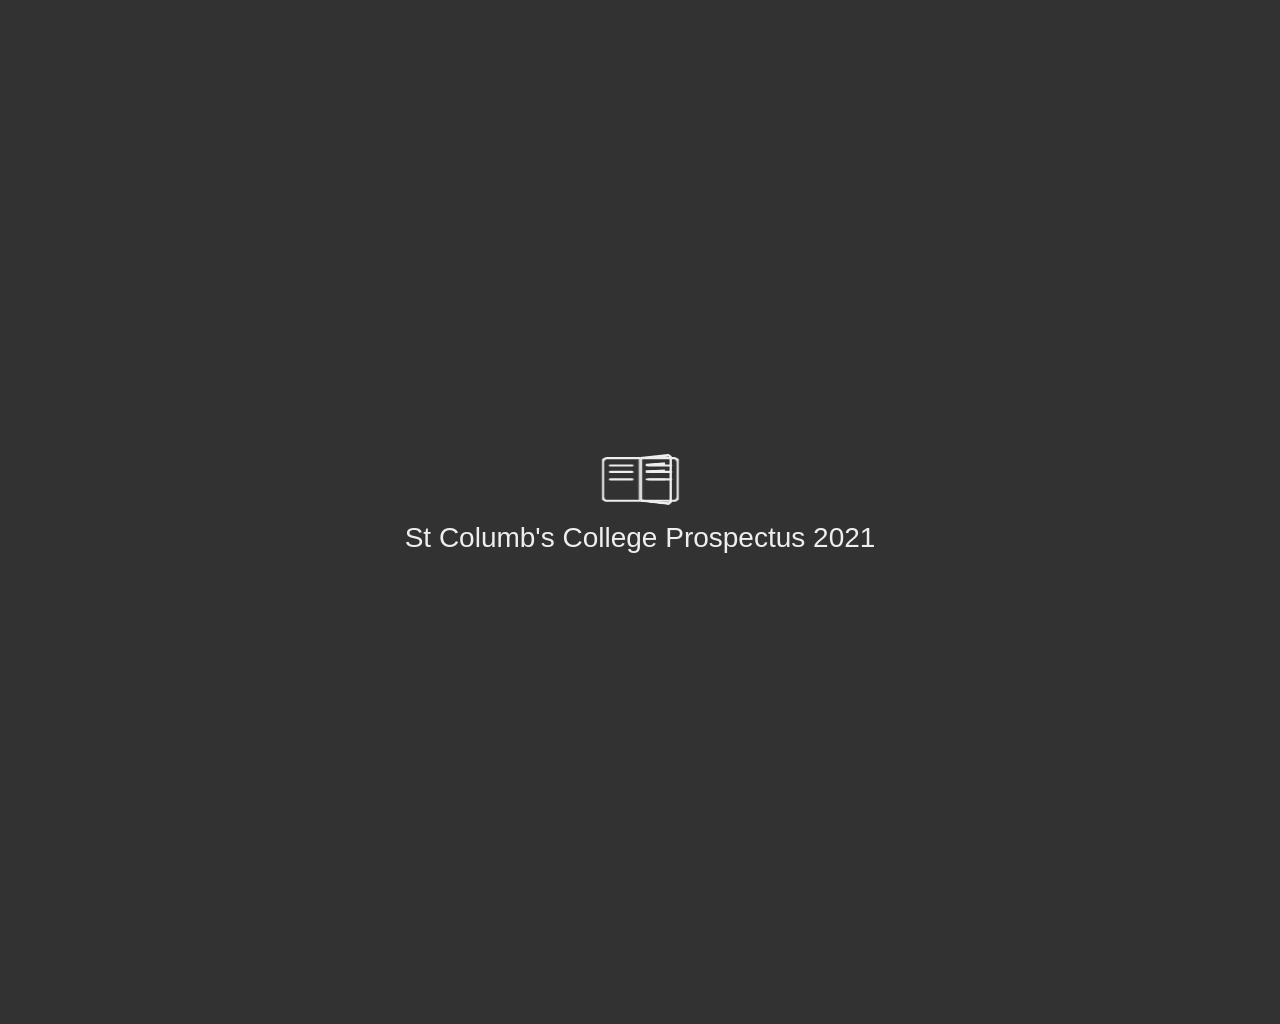 St. Columb's College Prospectus 2021